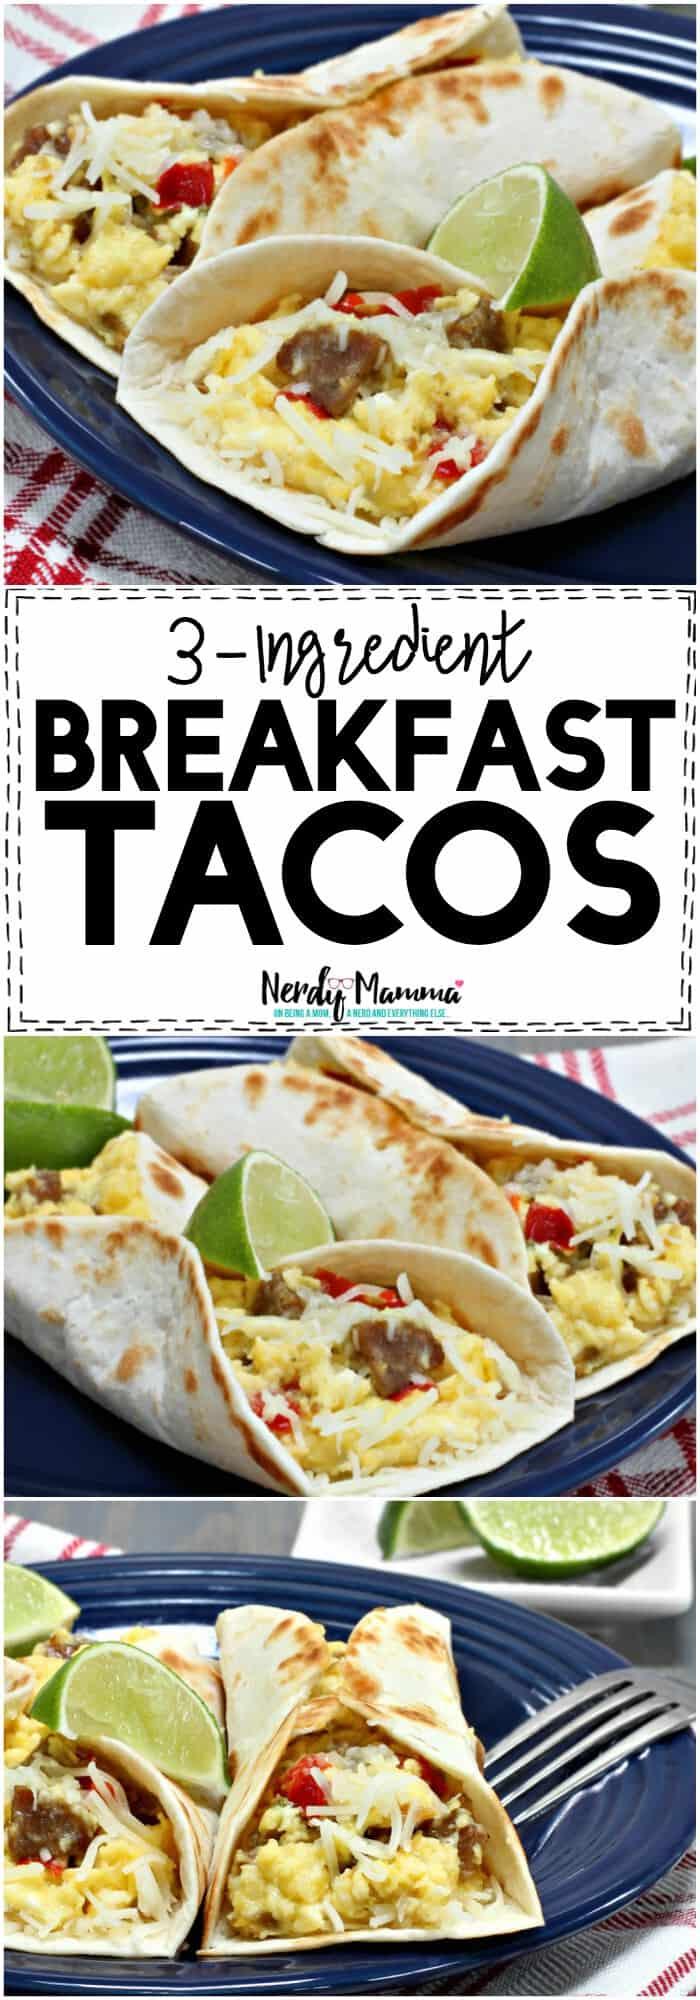 I love this 3-Ingredient Breakfast Tacos recipe. This is the single easiest breakfast taco recipe. It only has 3-ingredients! #breakfasttaco #breakfast #taco #tacos #simplerecipe #simplebreakfastrecipe #easybreakfastrecipe